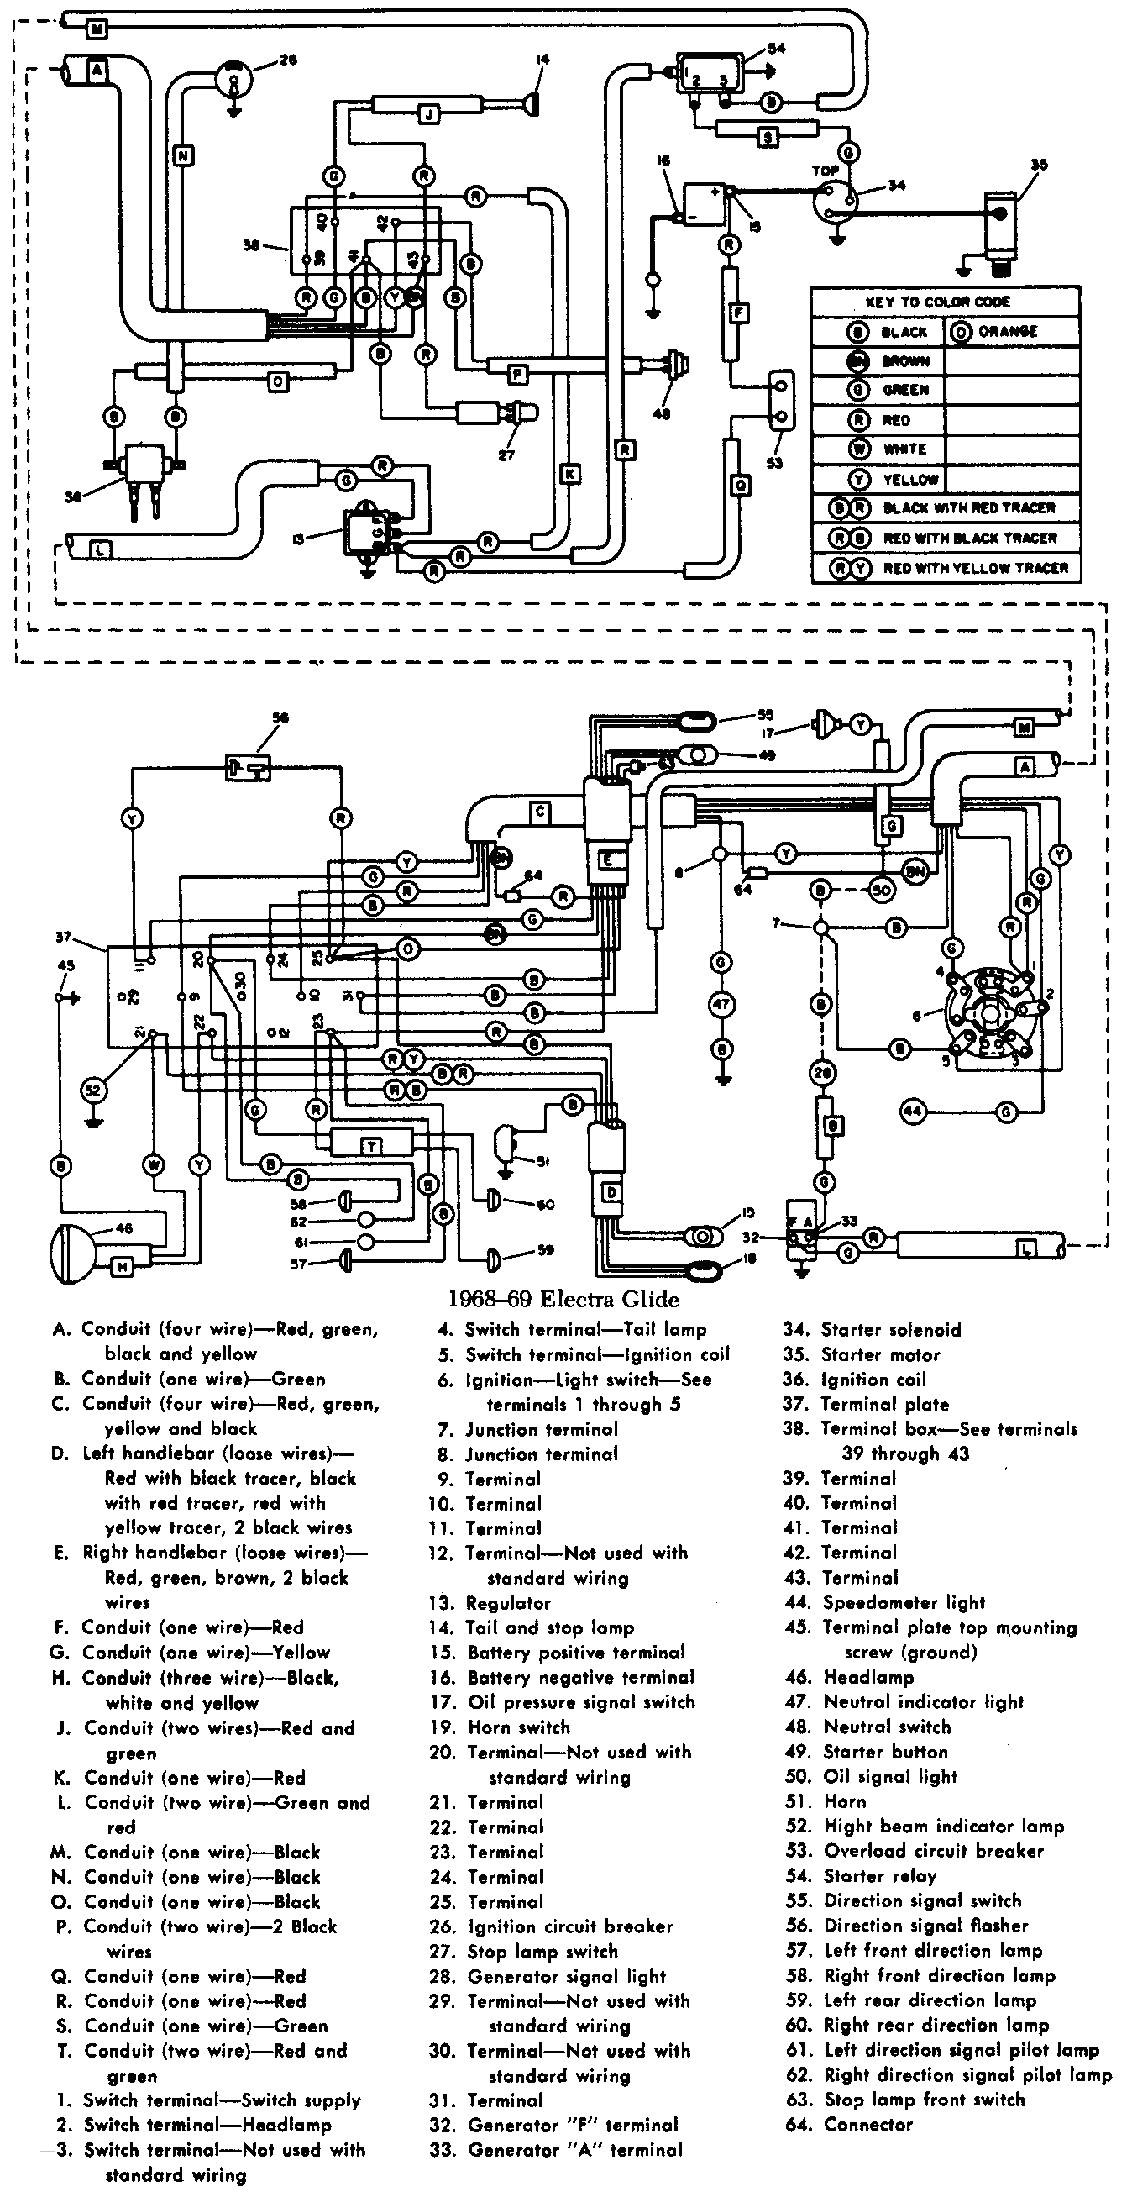 harley davidson radio wiring harness diagram elegant harley davidson radio wiring diagram new er diagram double line free jpg